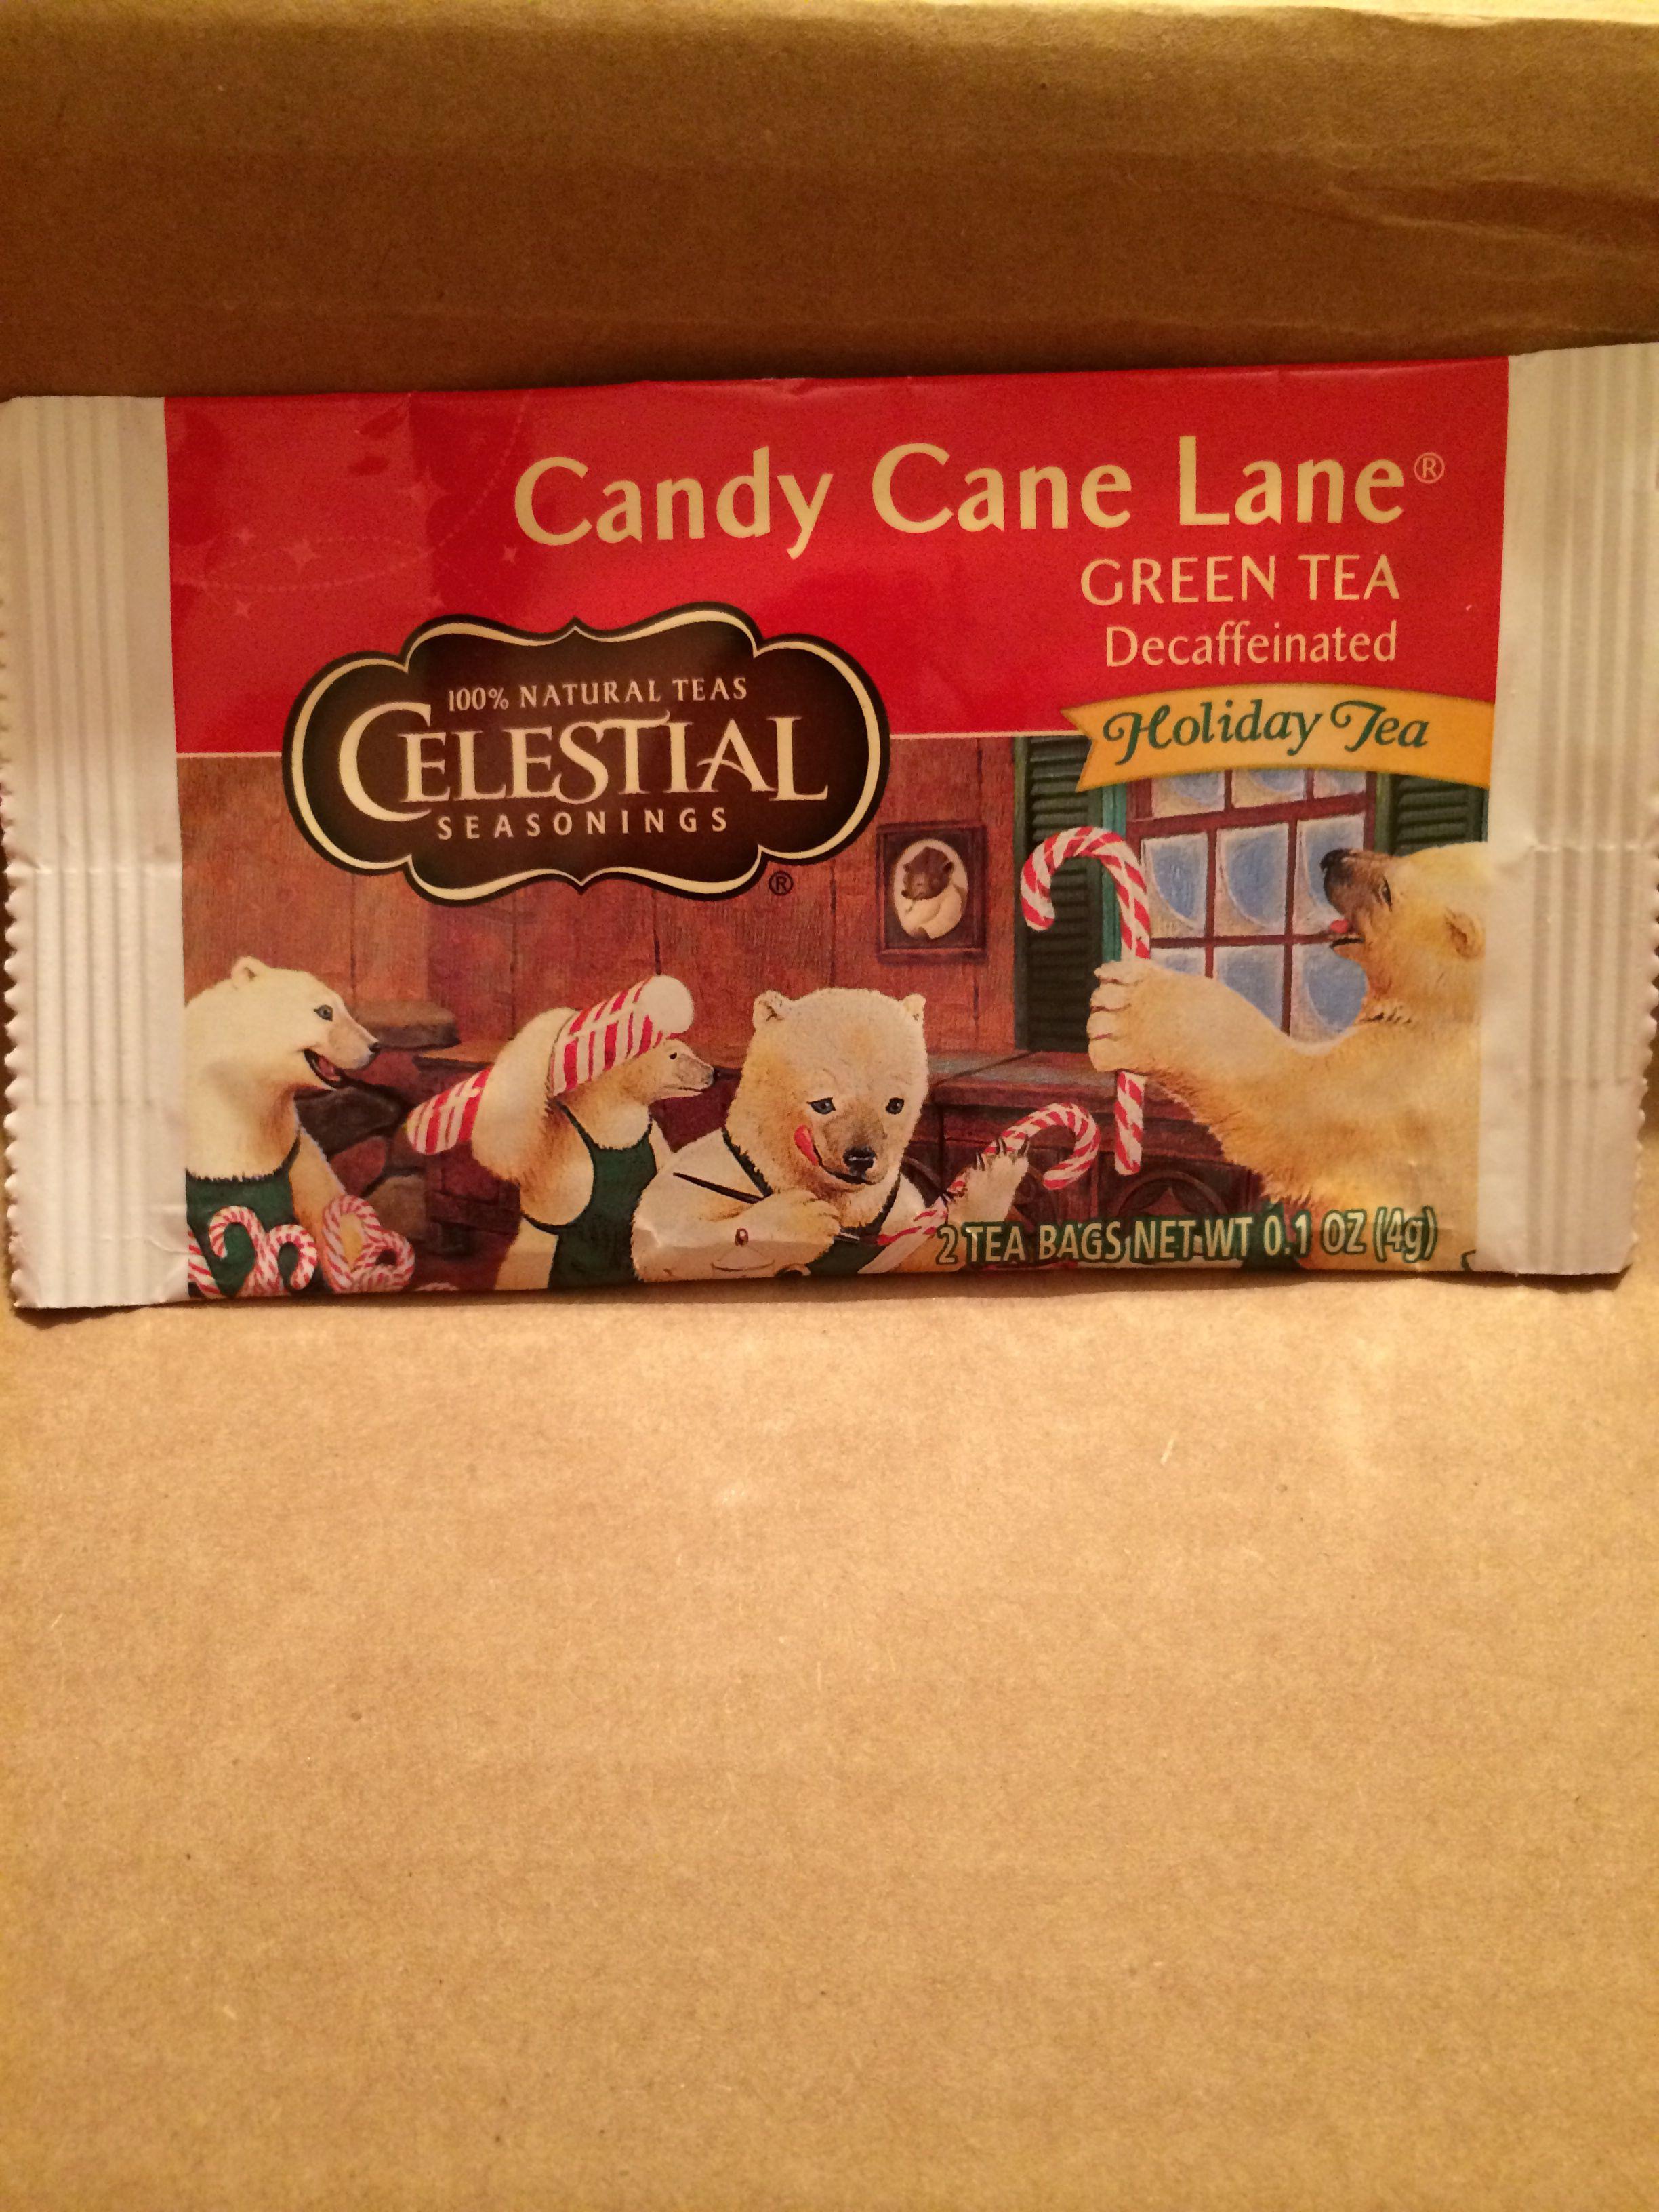 Celestial Seasonings Candy Cane Lane Decaf Green Tea. Live